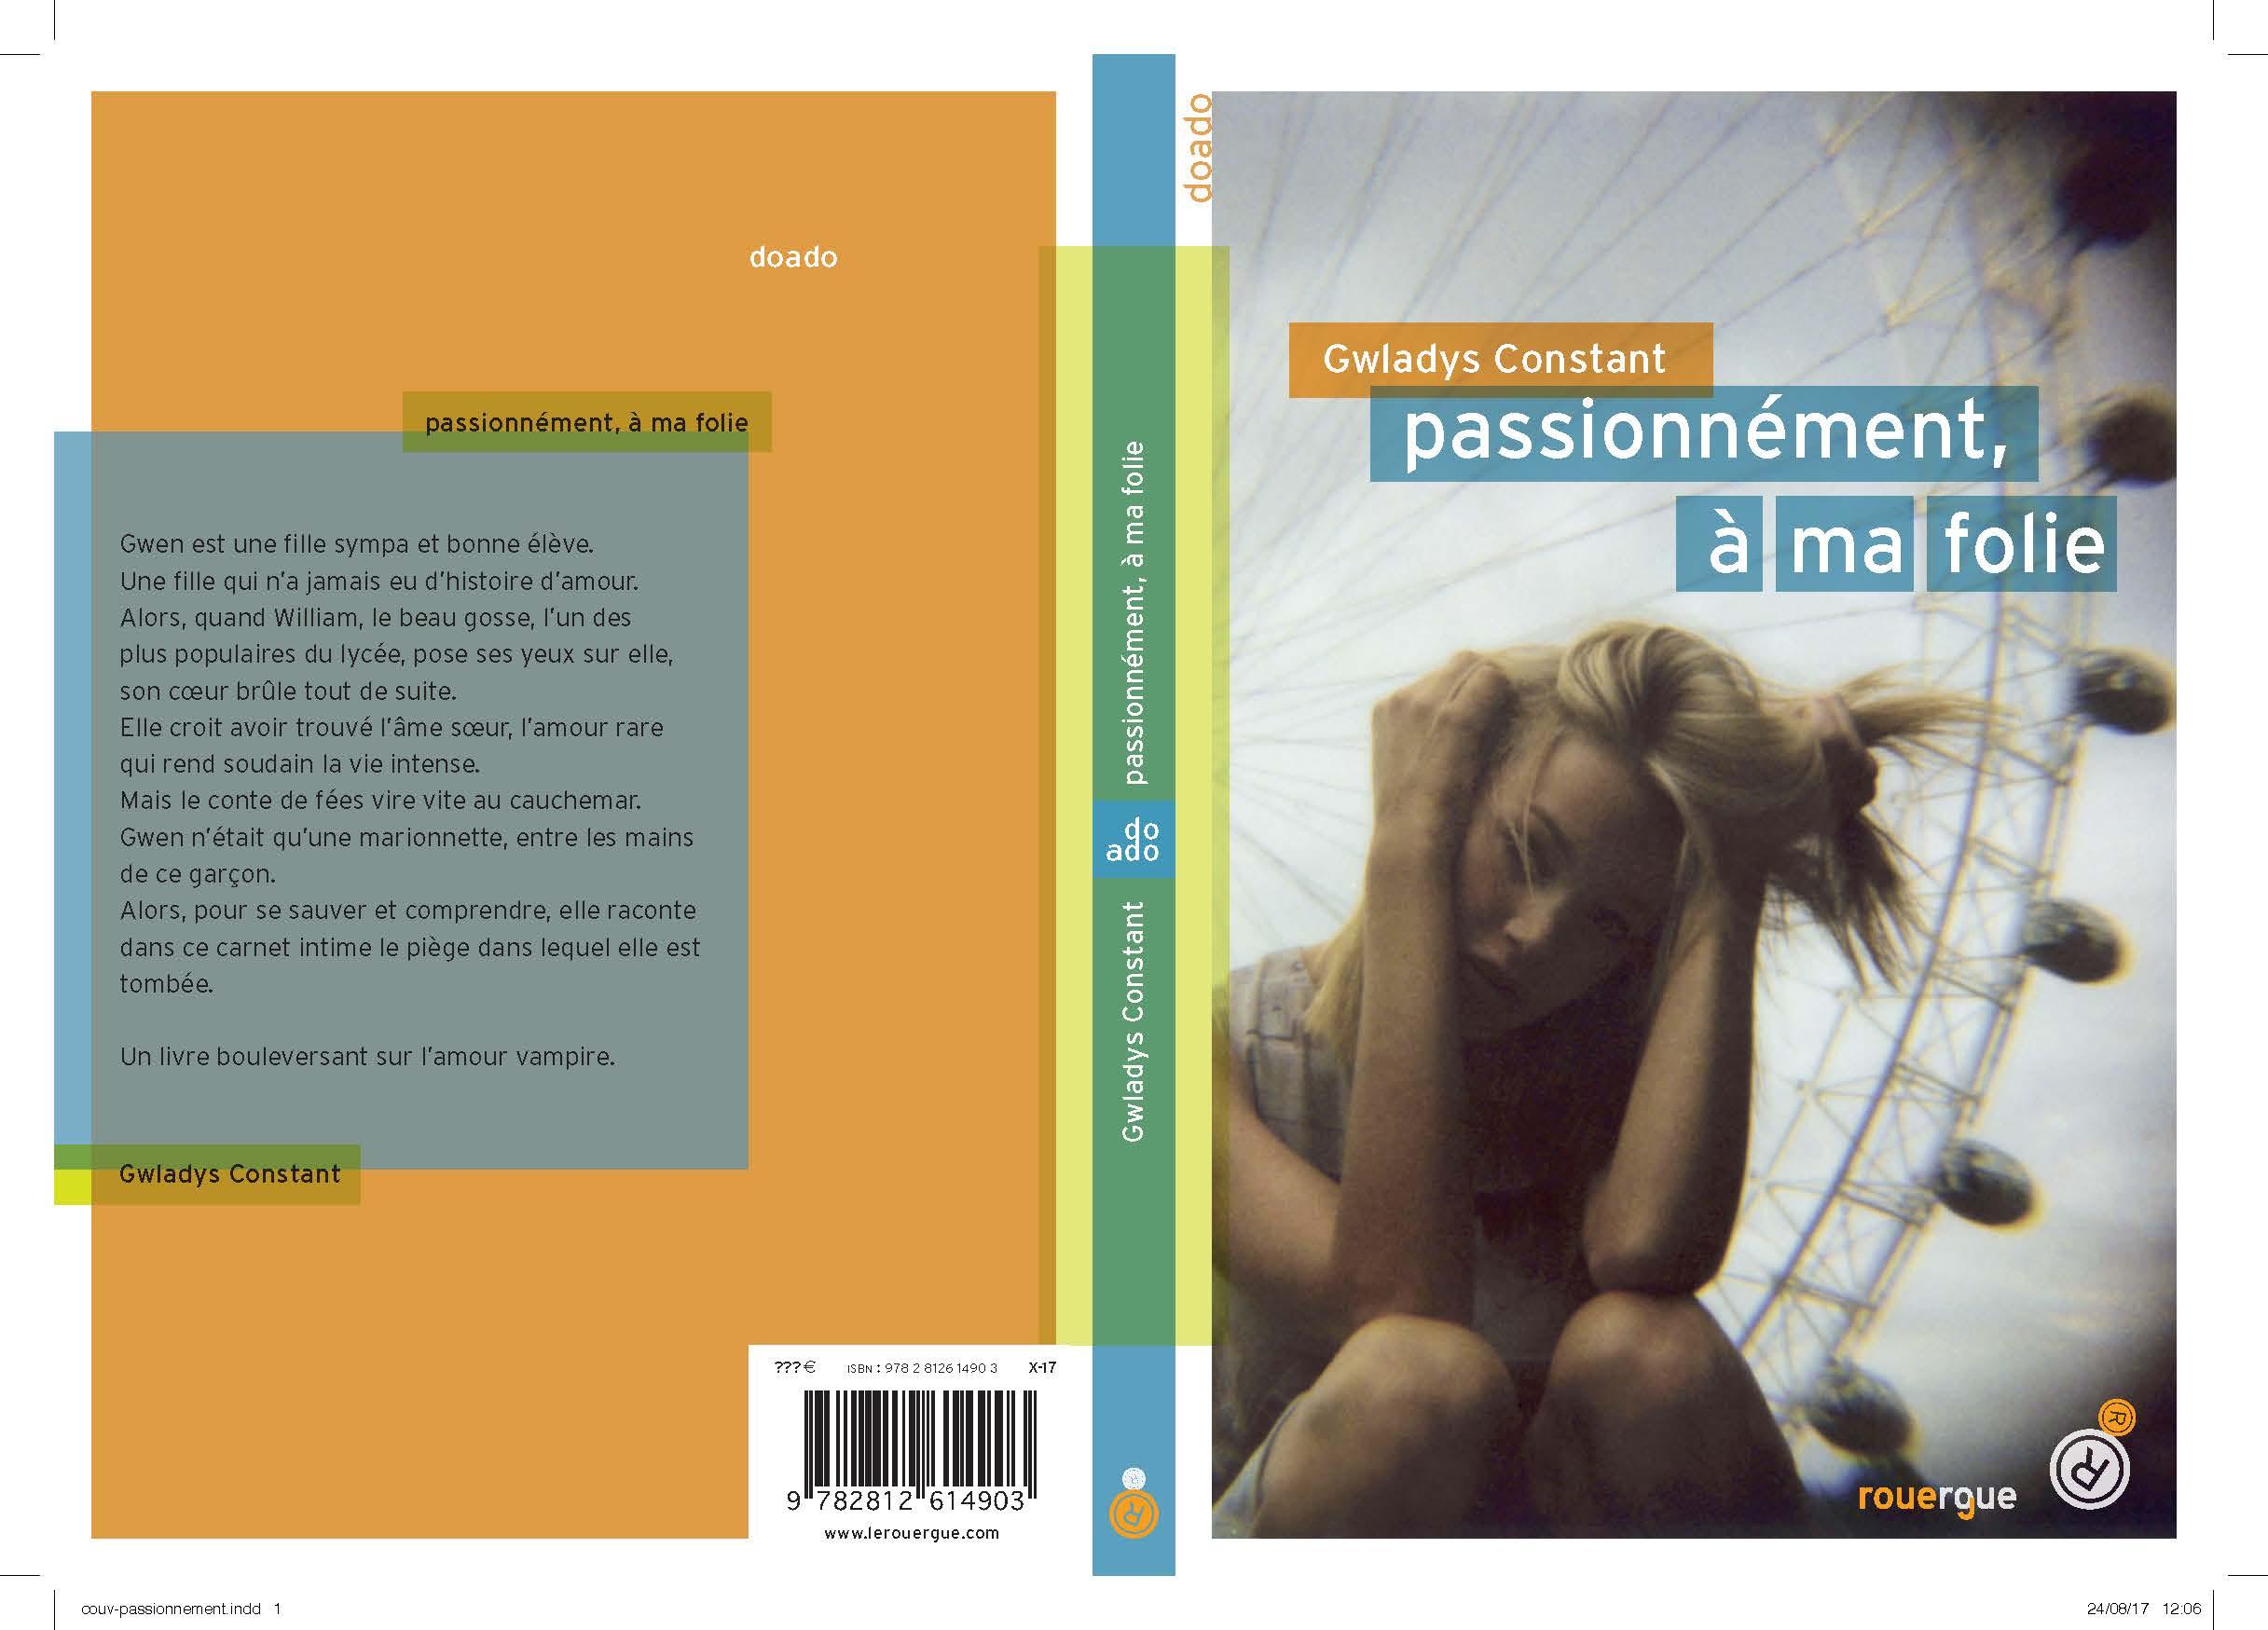 couv-passionnement-ok[2].jpg